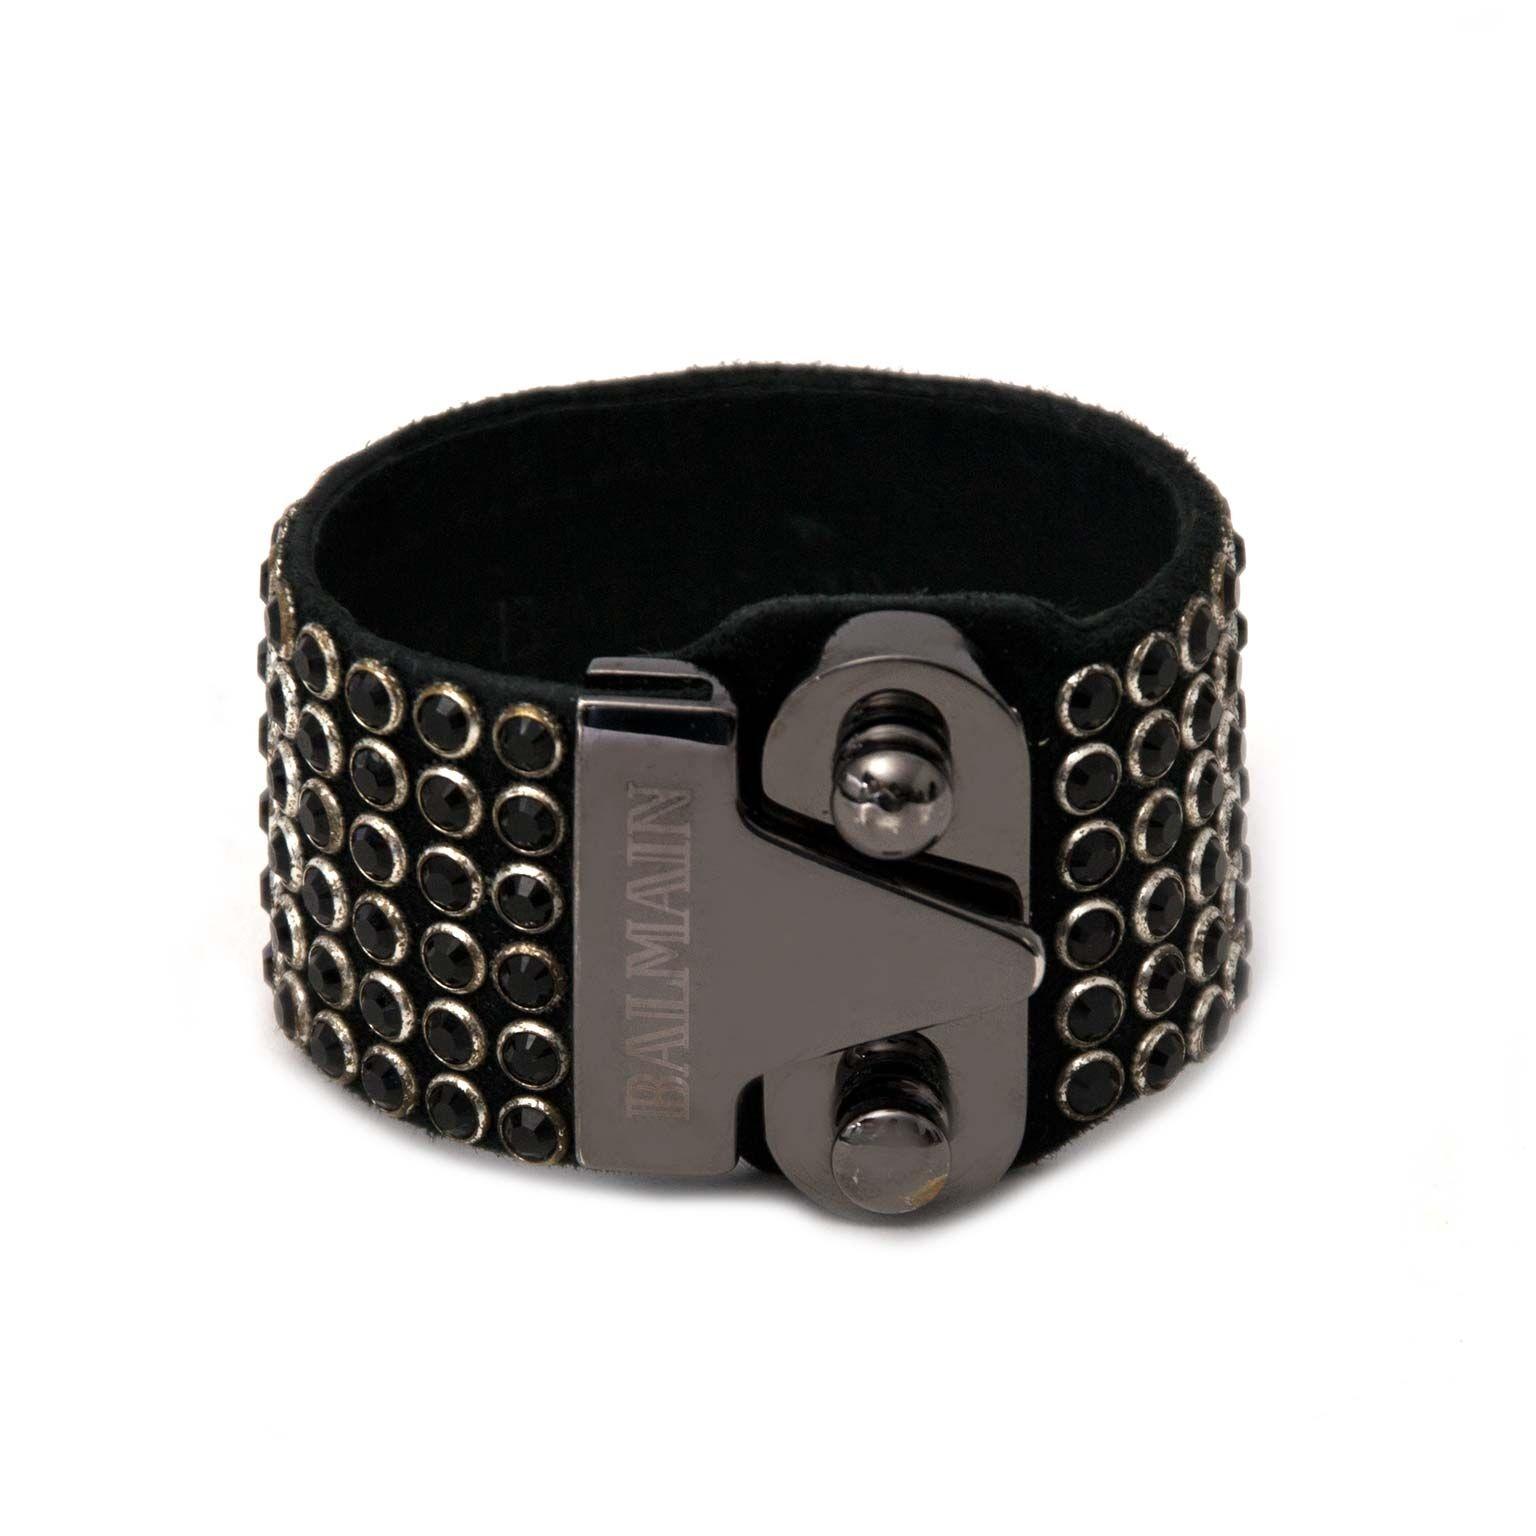 secondhand black leather bracelet for sale at labellov